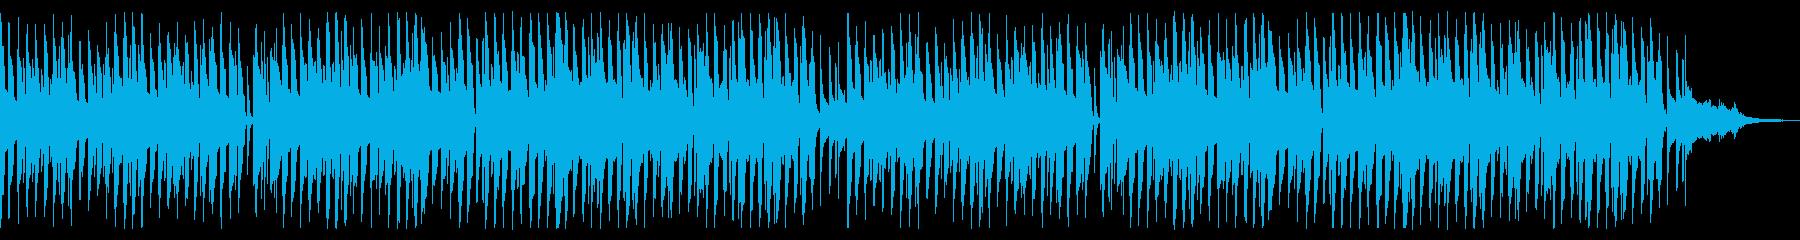 YouTubeに 弾むような可愛いBGMの再生済みの波形